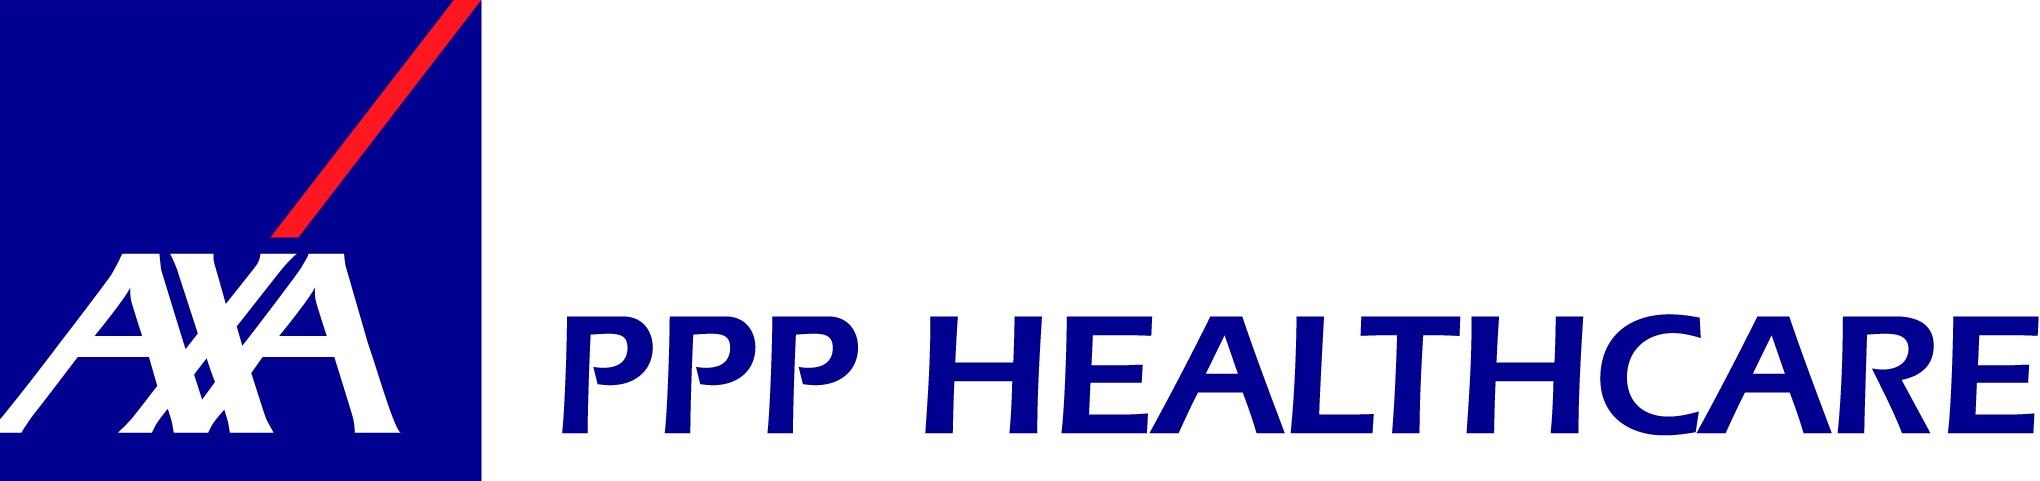 AXA Healthcare insurance psychology oxford